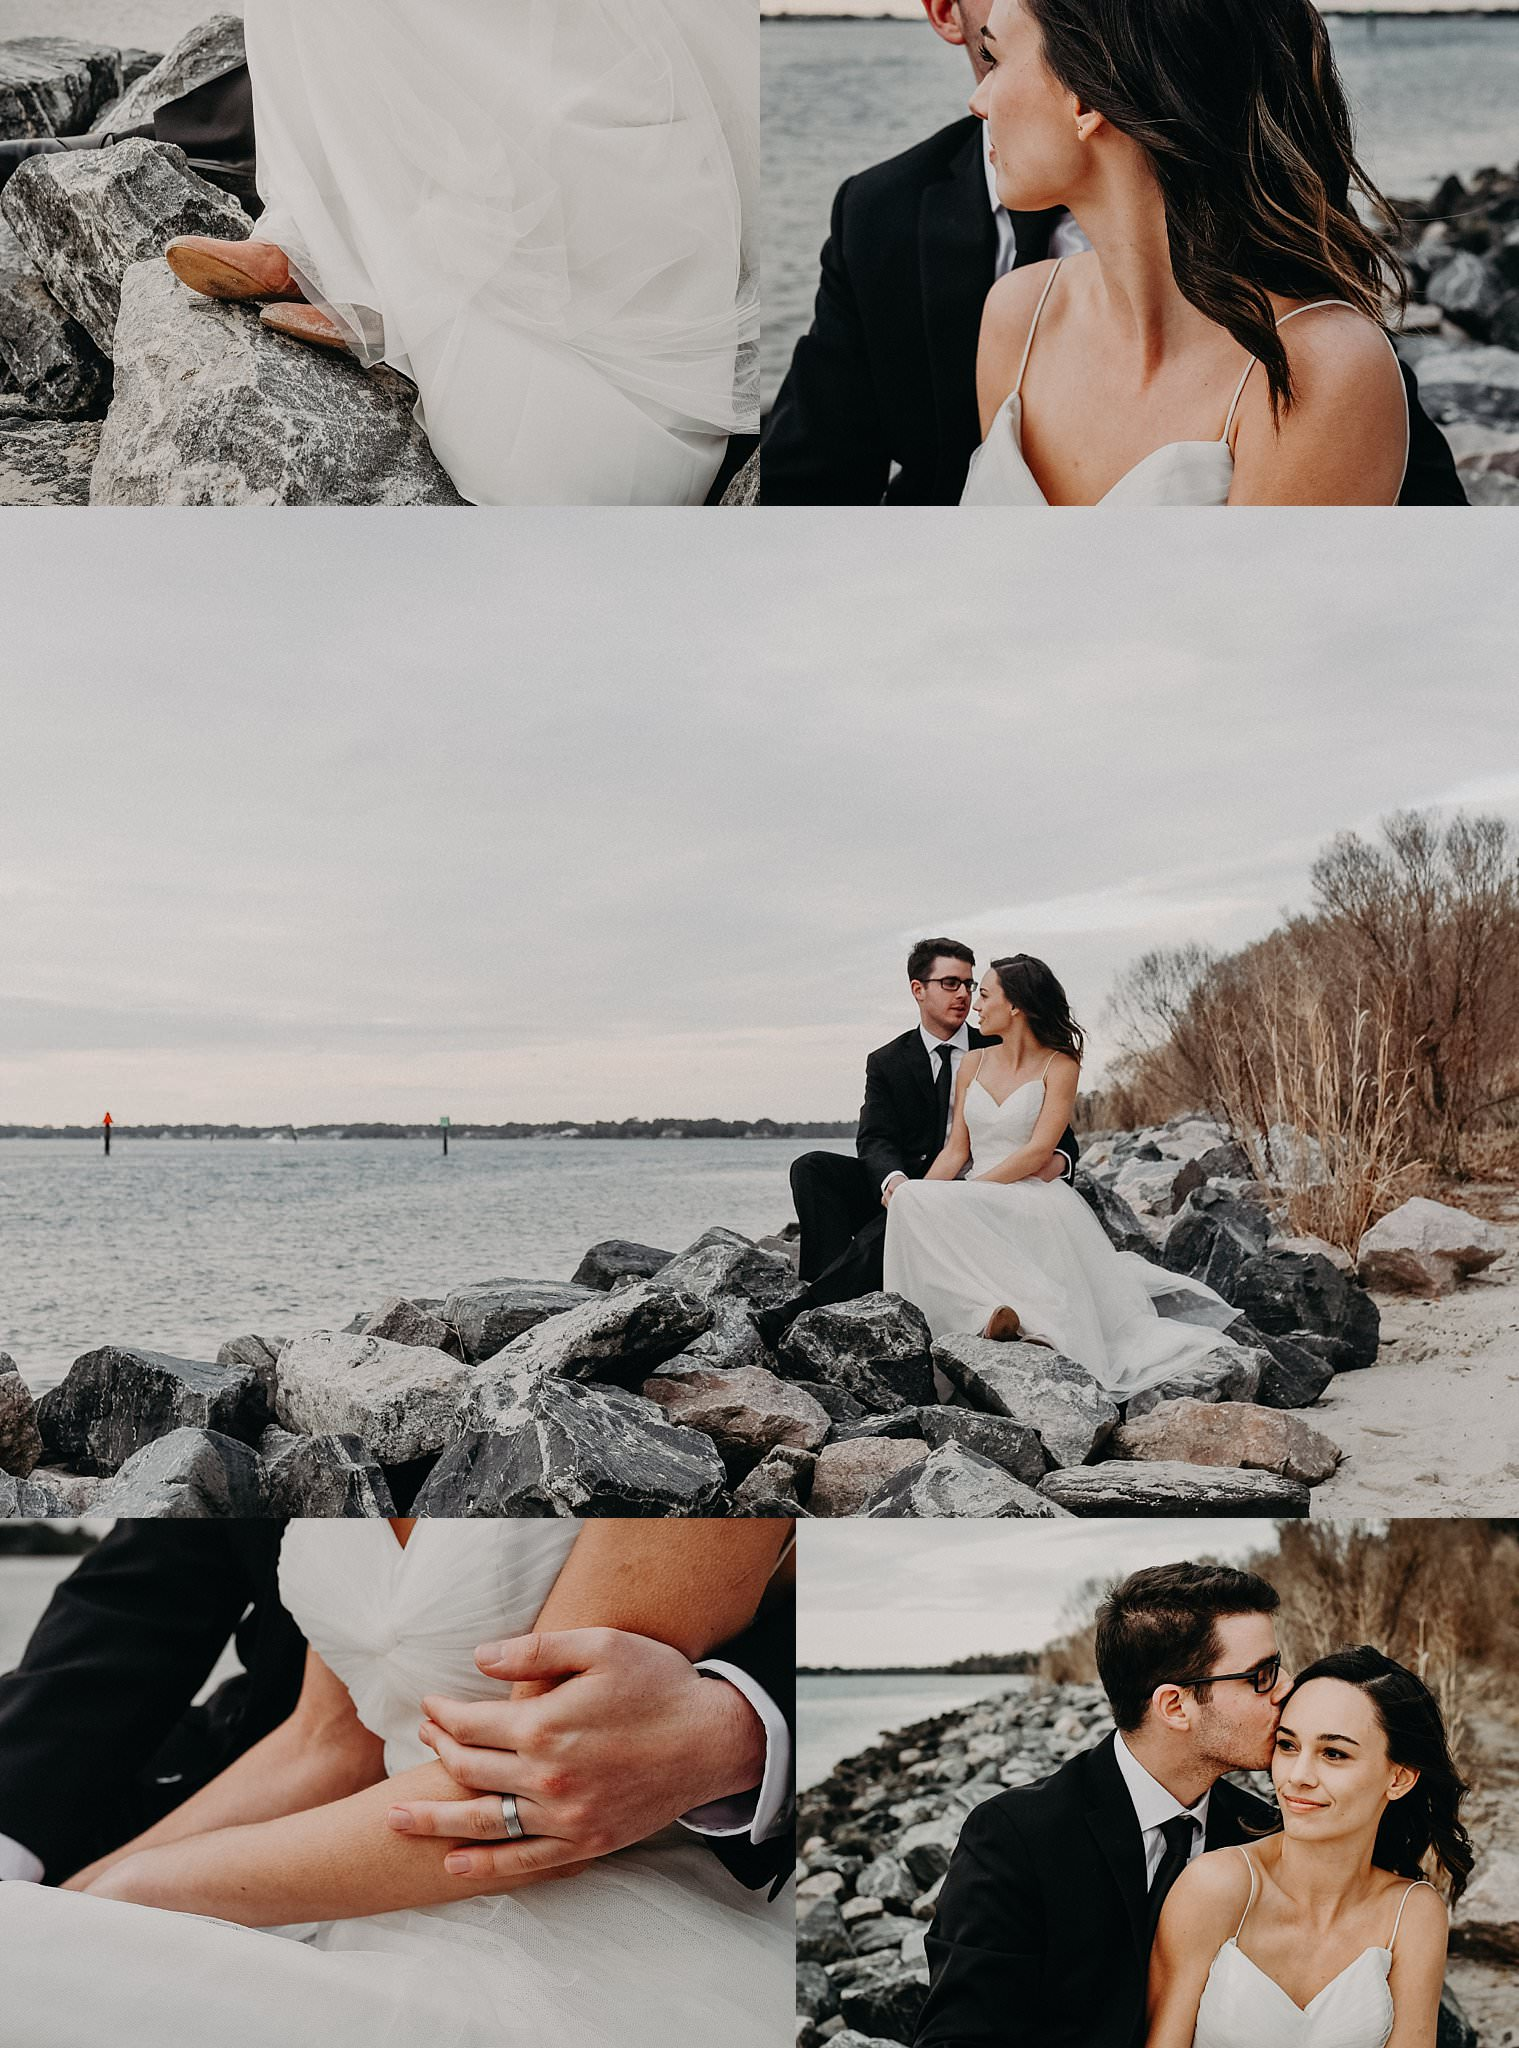 wedding-photos-first-landing-state-park-virginia-beach-elopement-session-melissa-bliss-photography.jpg